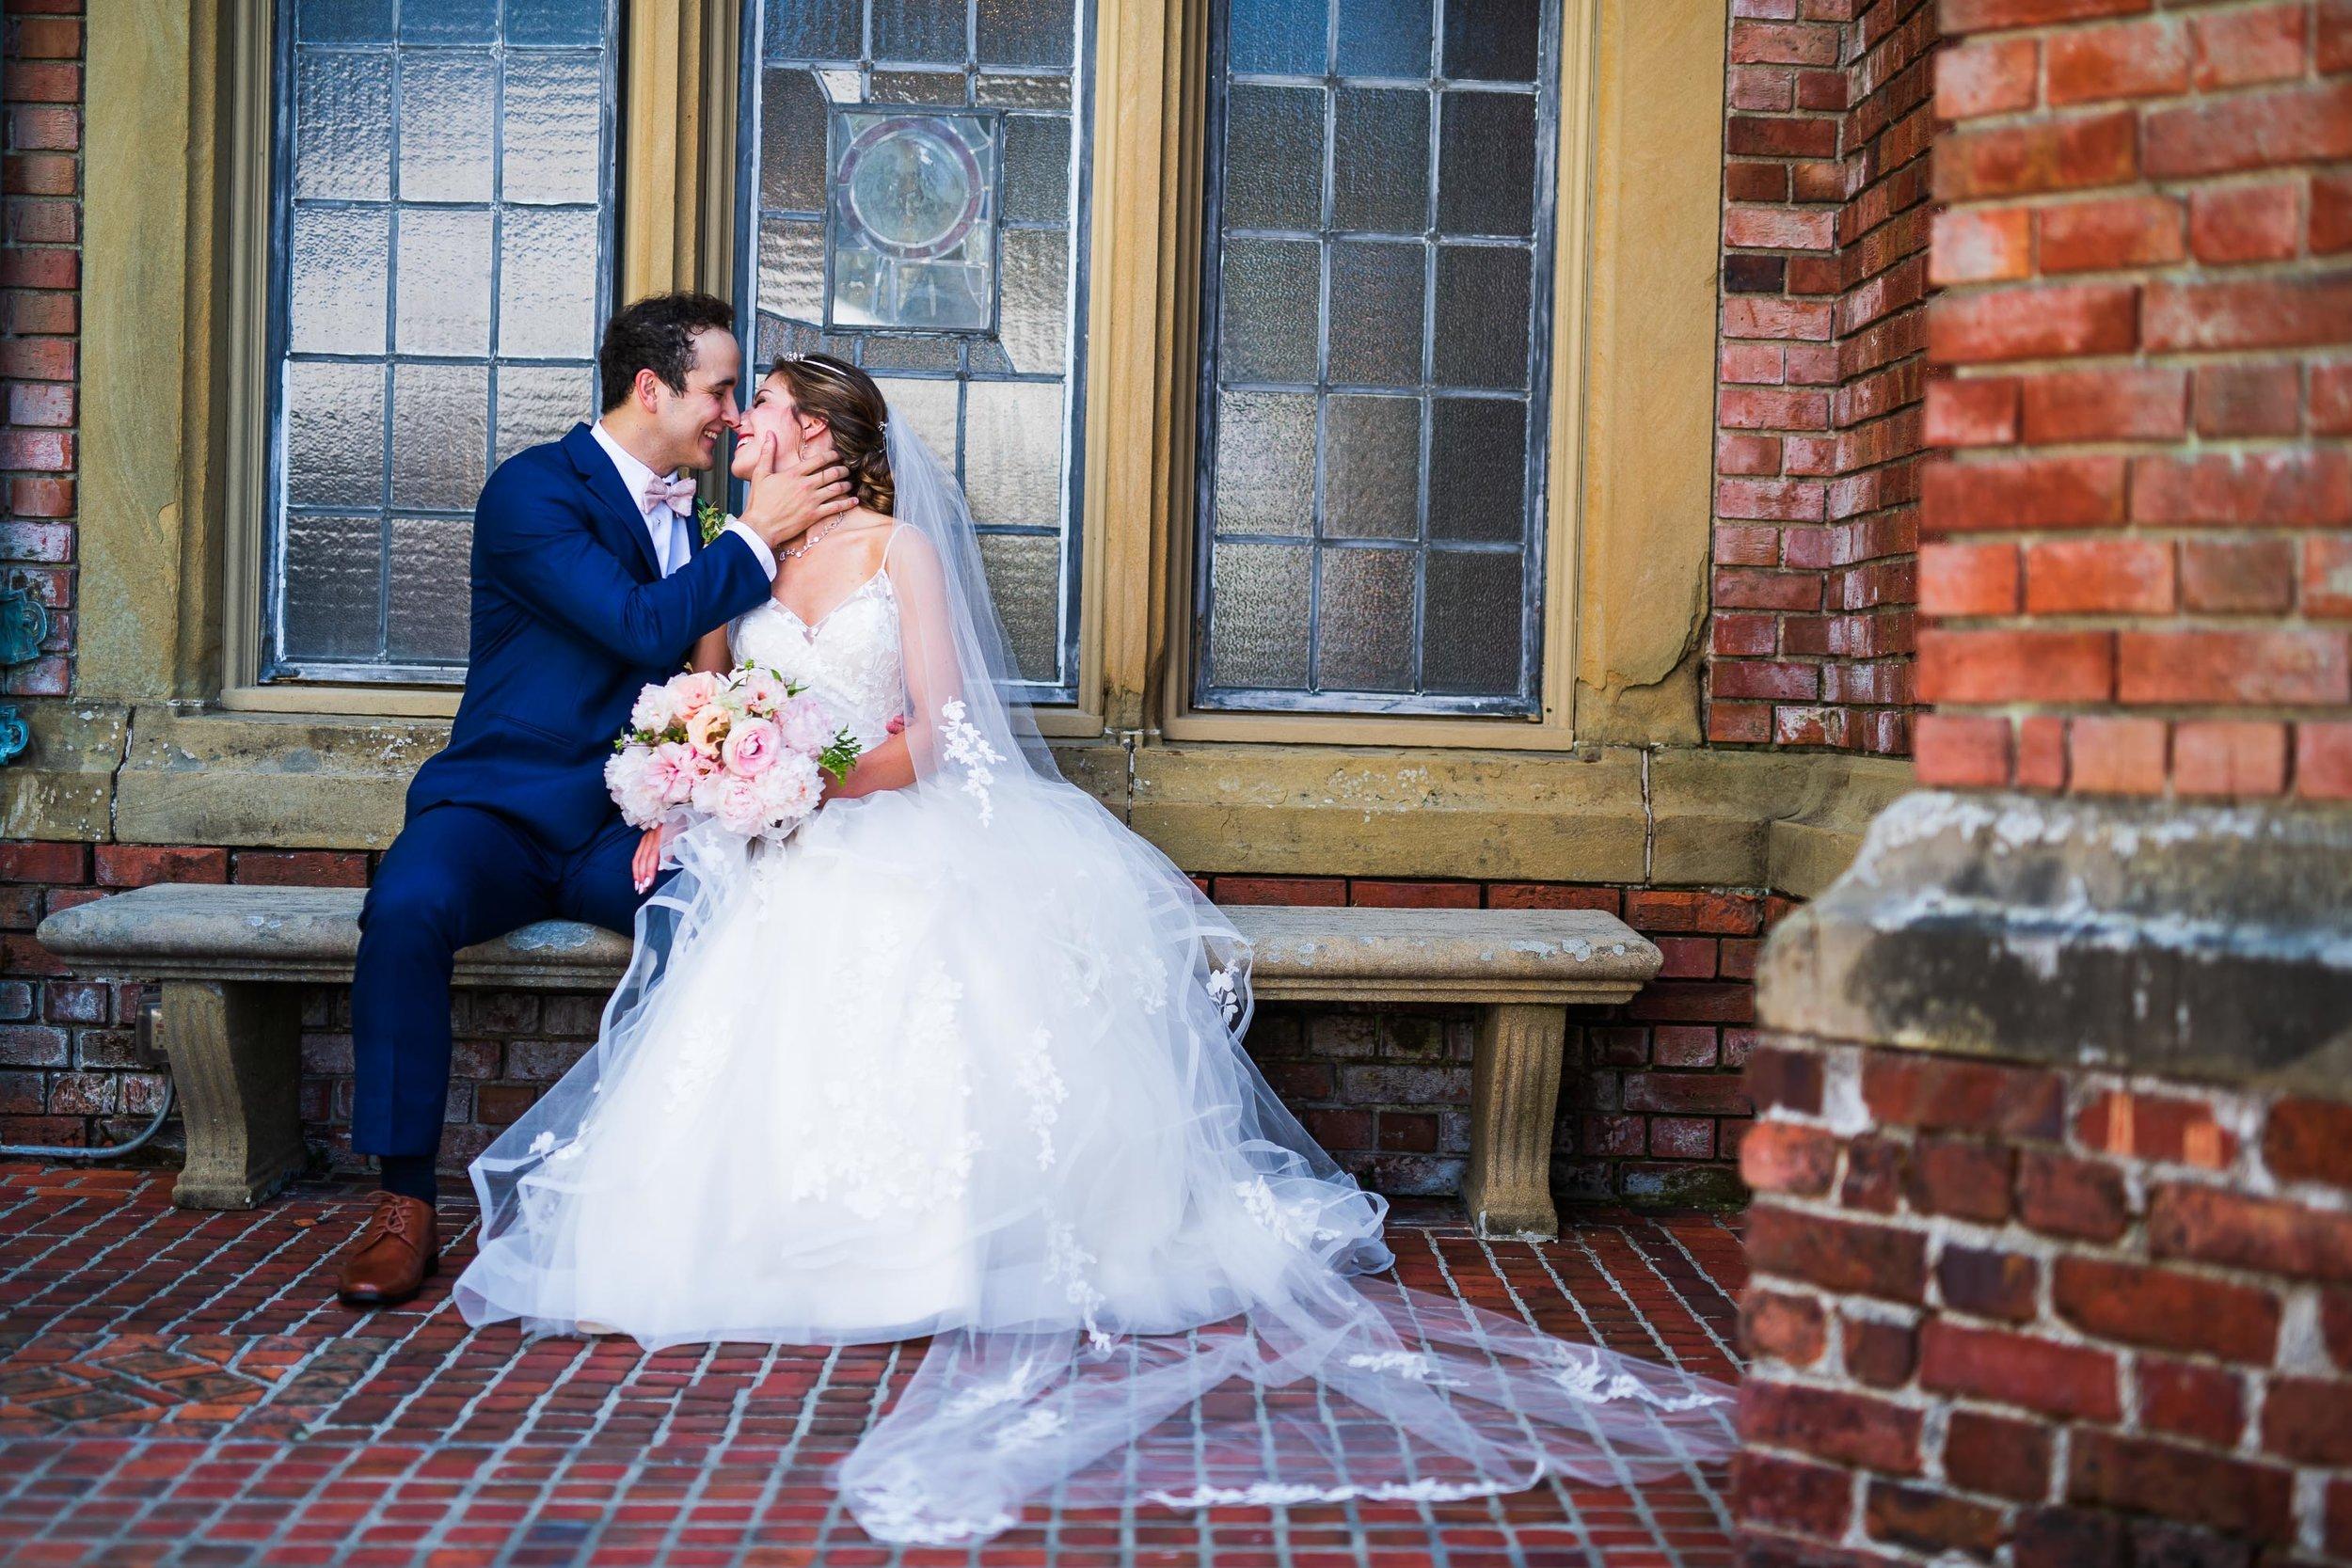 thornewood castle wedding 26.jpg